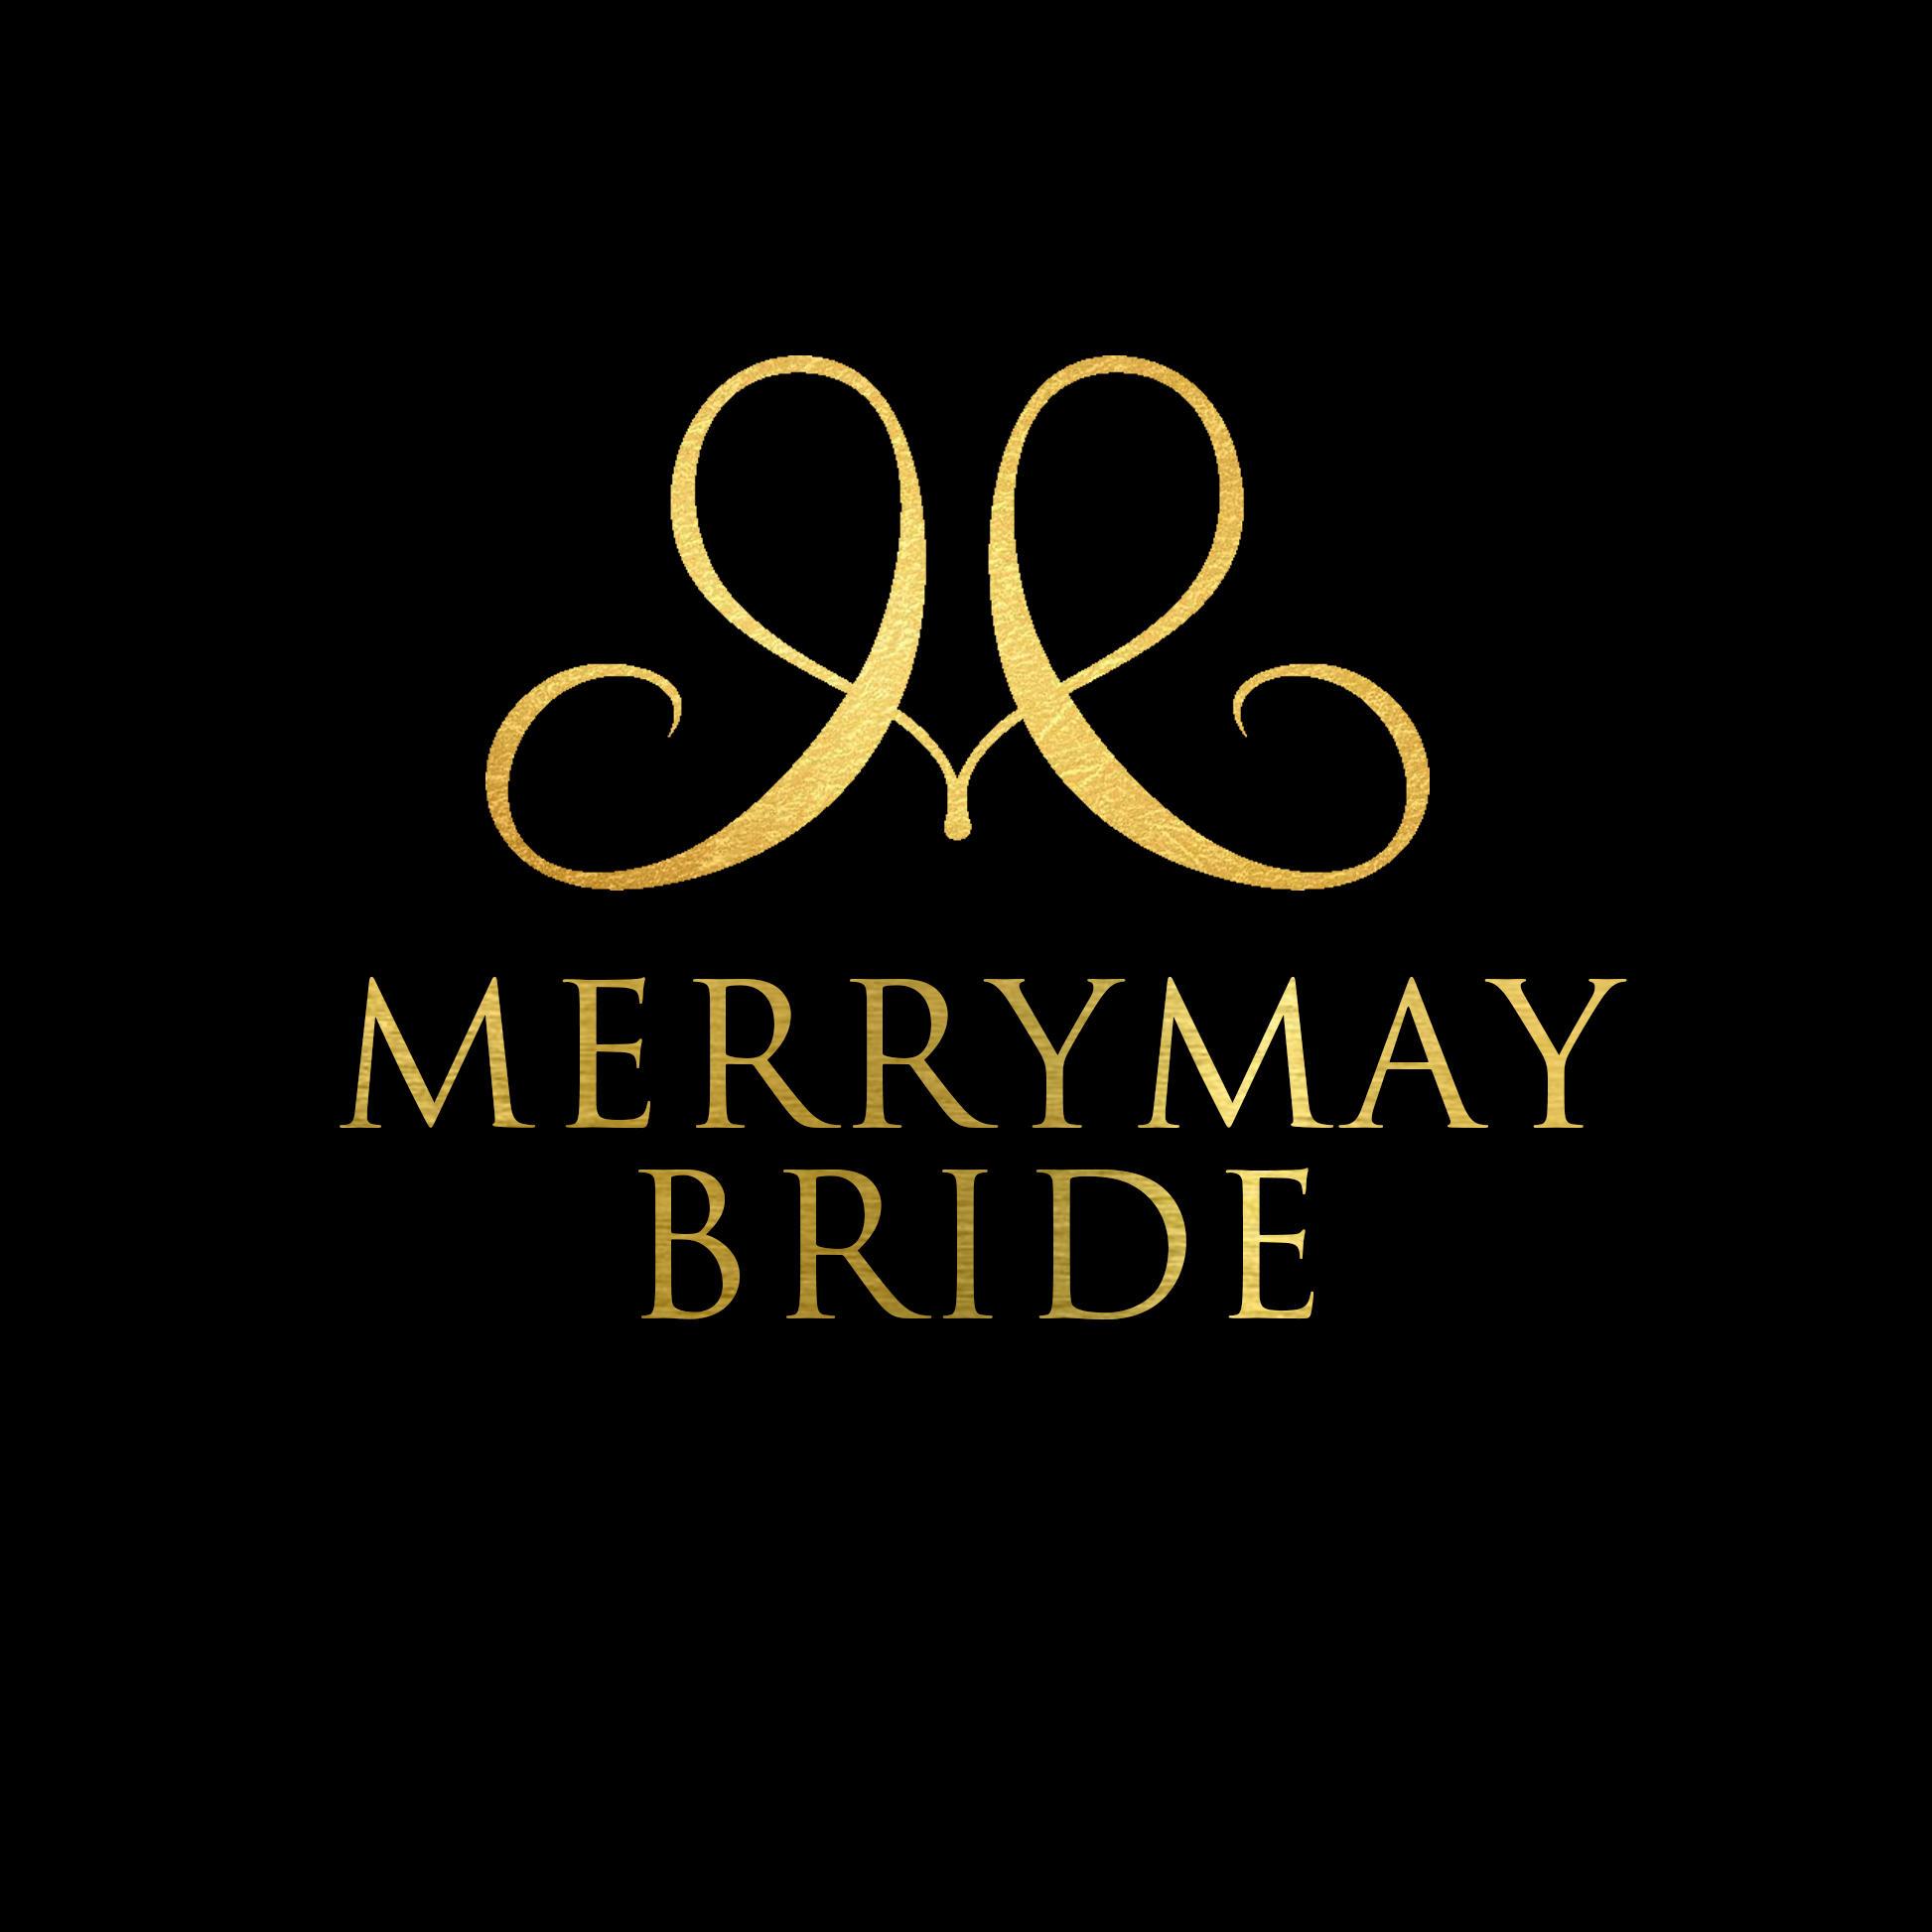 MERRYMAYBRIDE 栀夏注册送35元的体验金